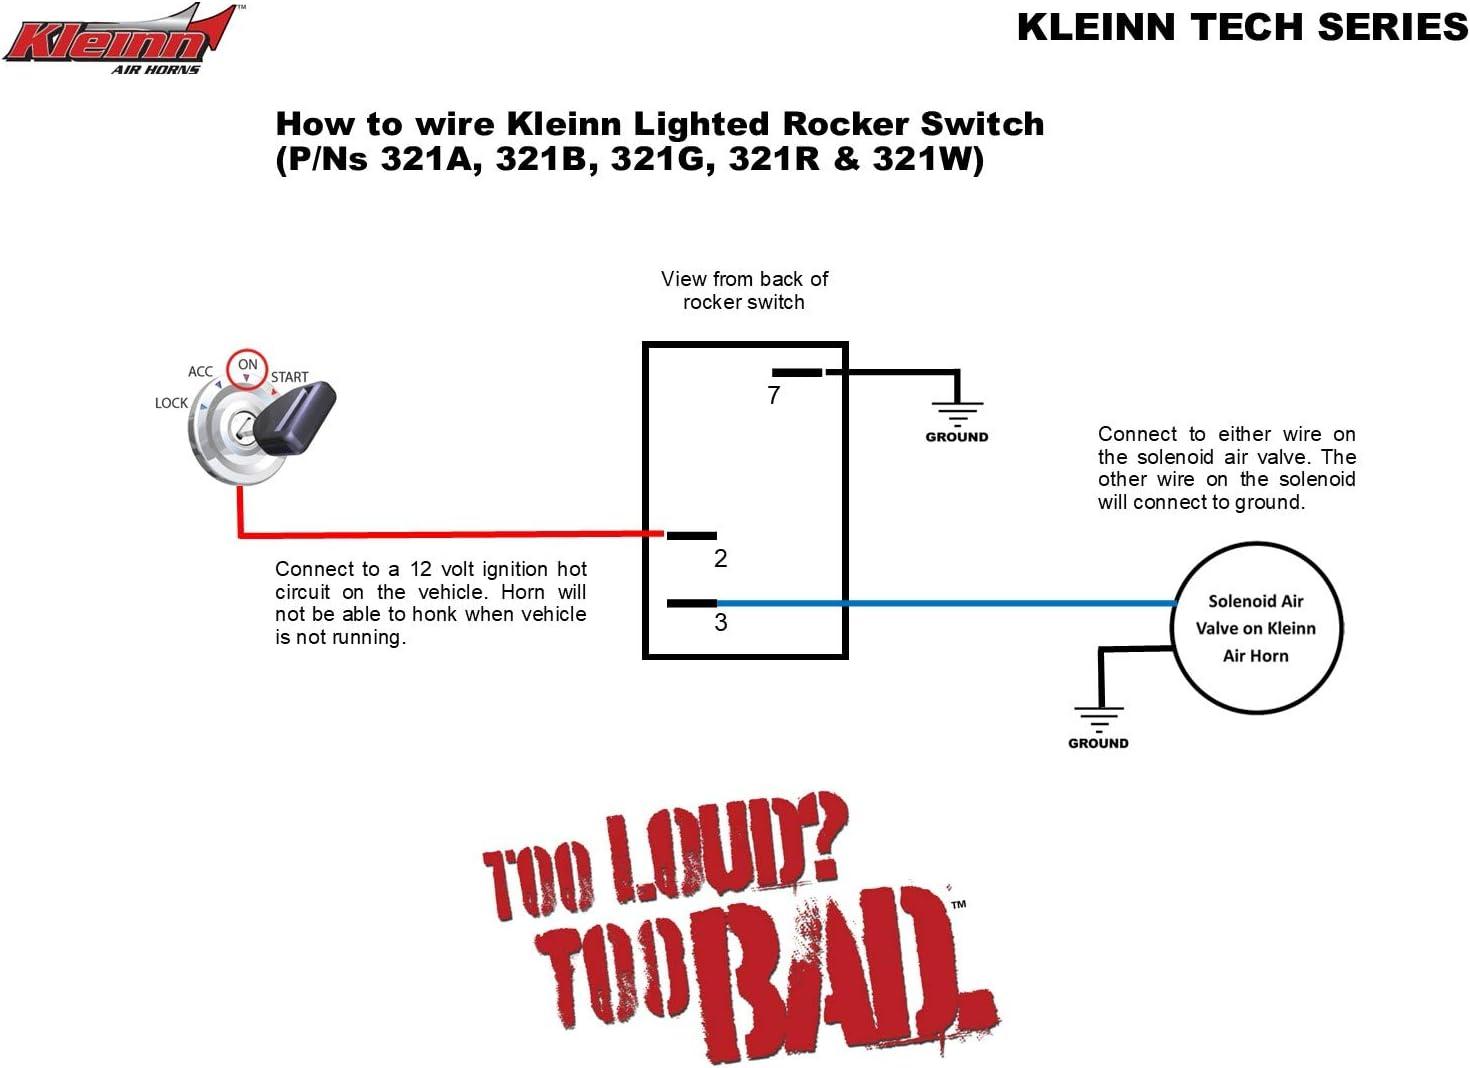 Amazon.com: Kleinn Air Horns Rocker Switch - Blue, 321B: AutomotiveAmazon.com